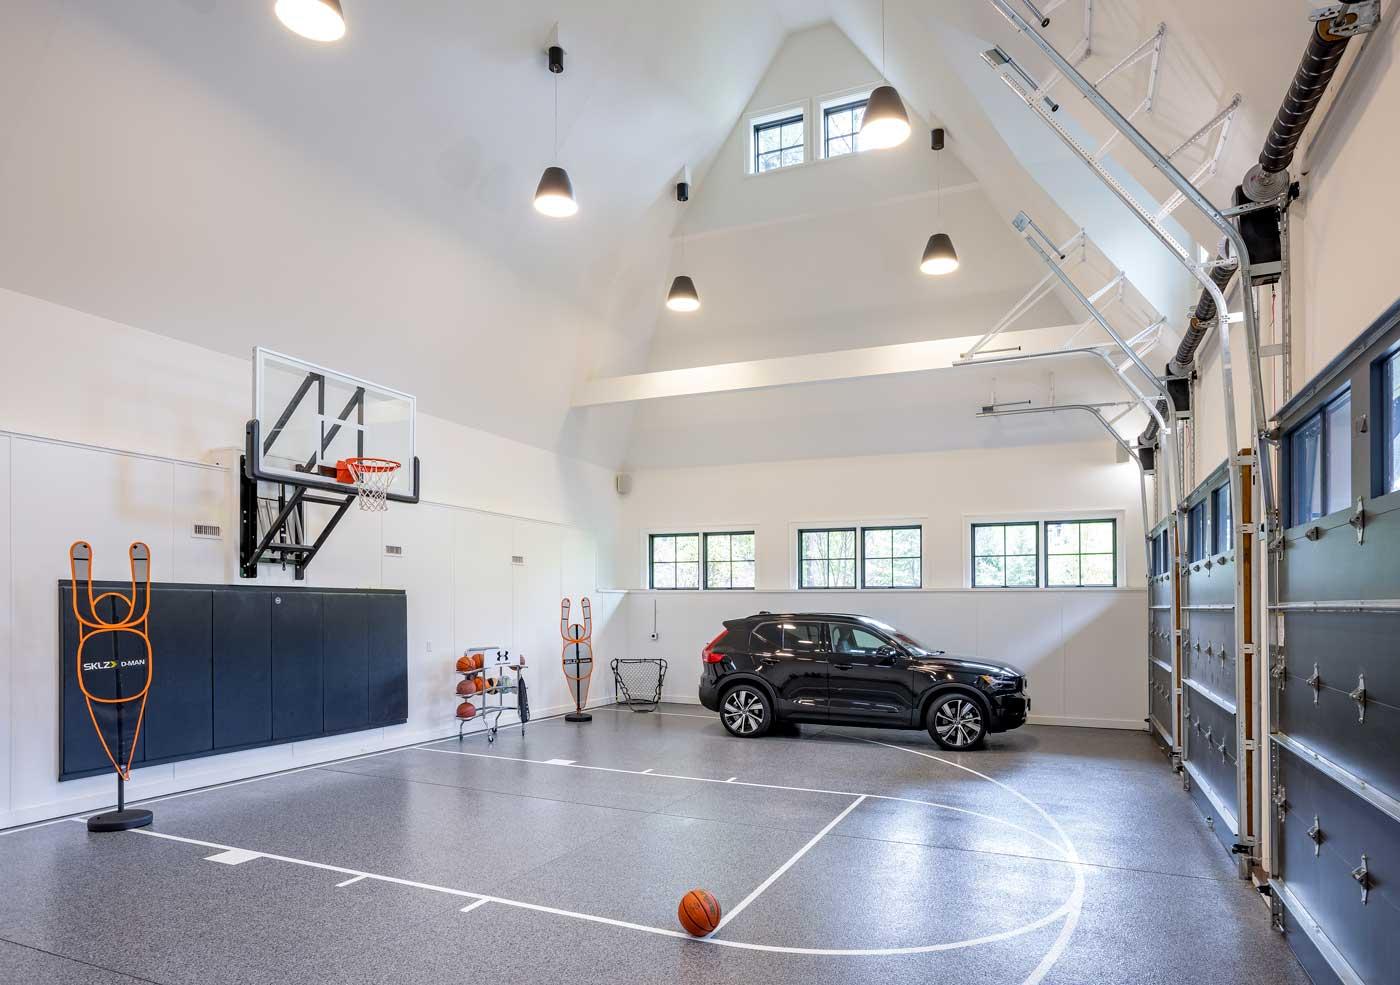 indoor basketball court and garage